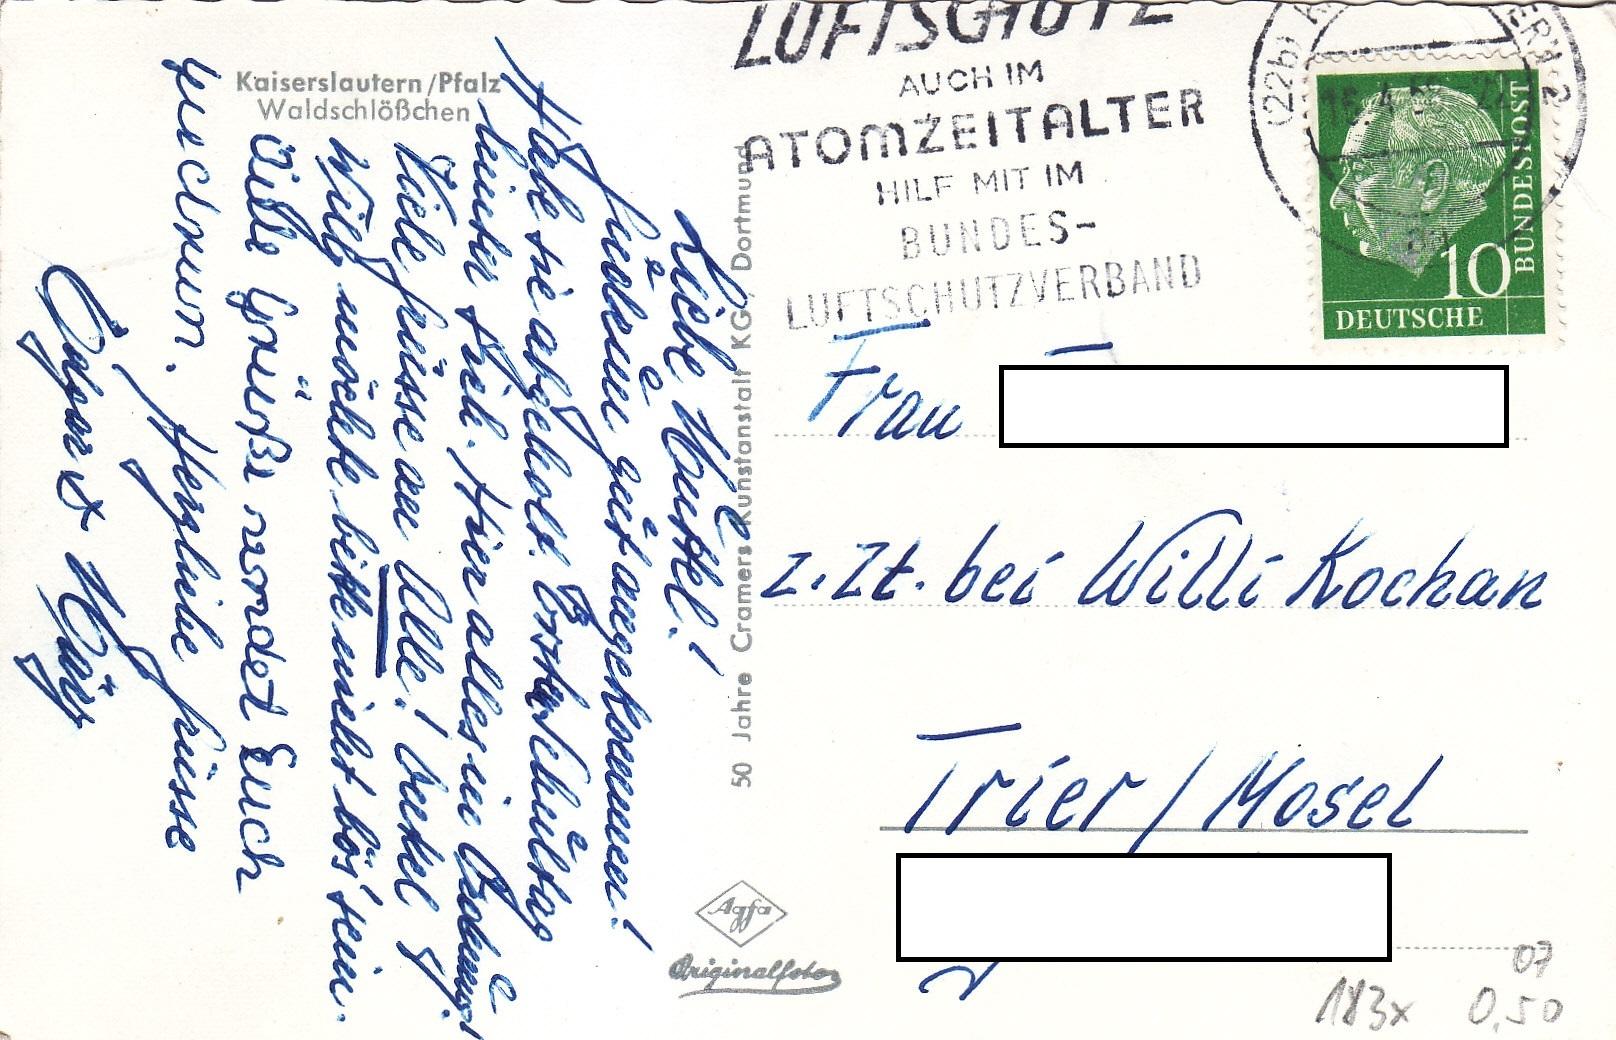 BRD #183x Theodor Heuss